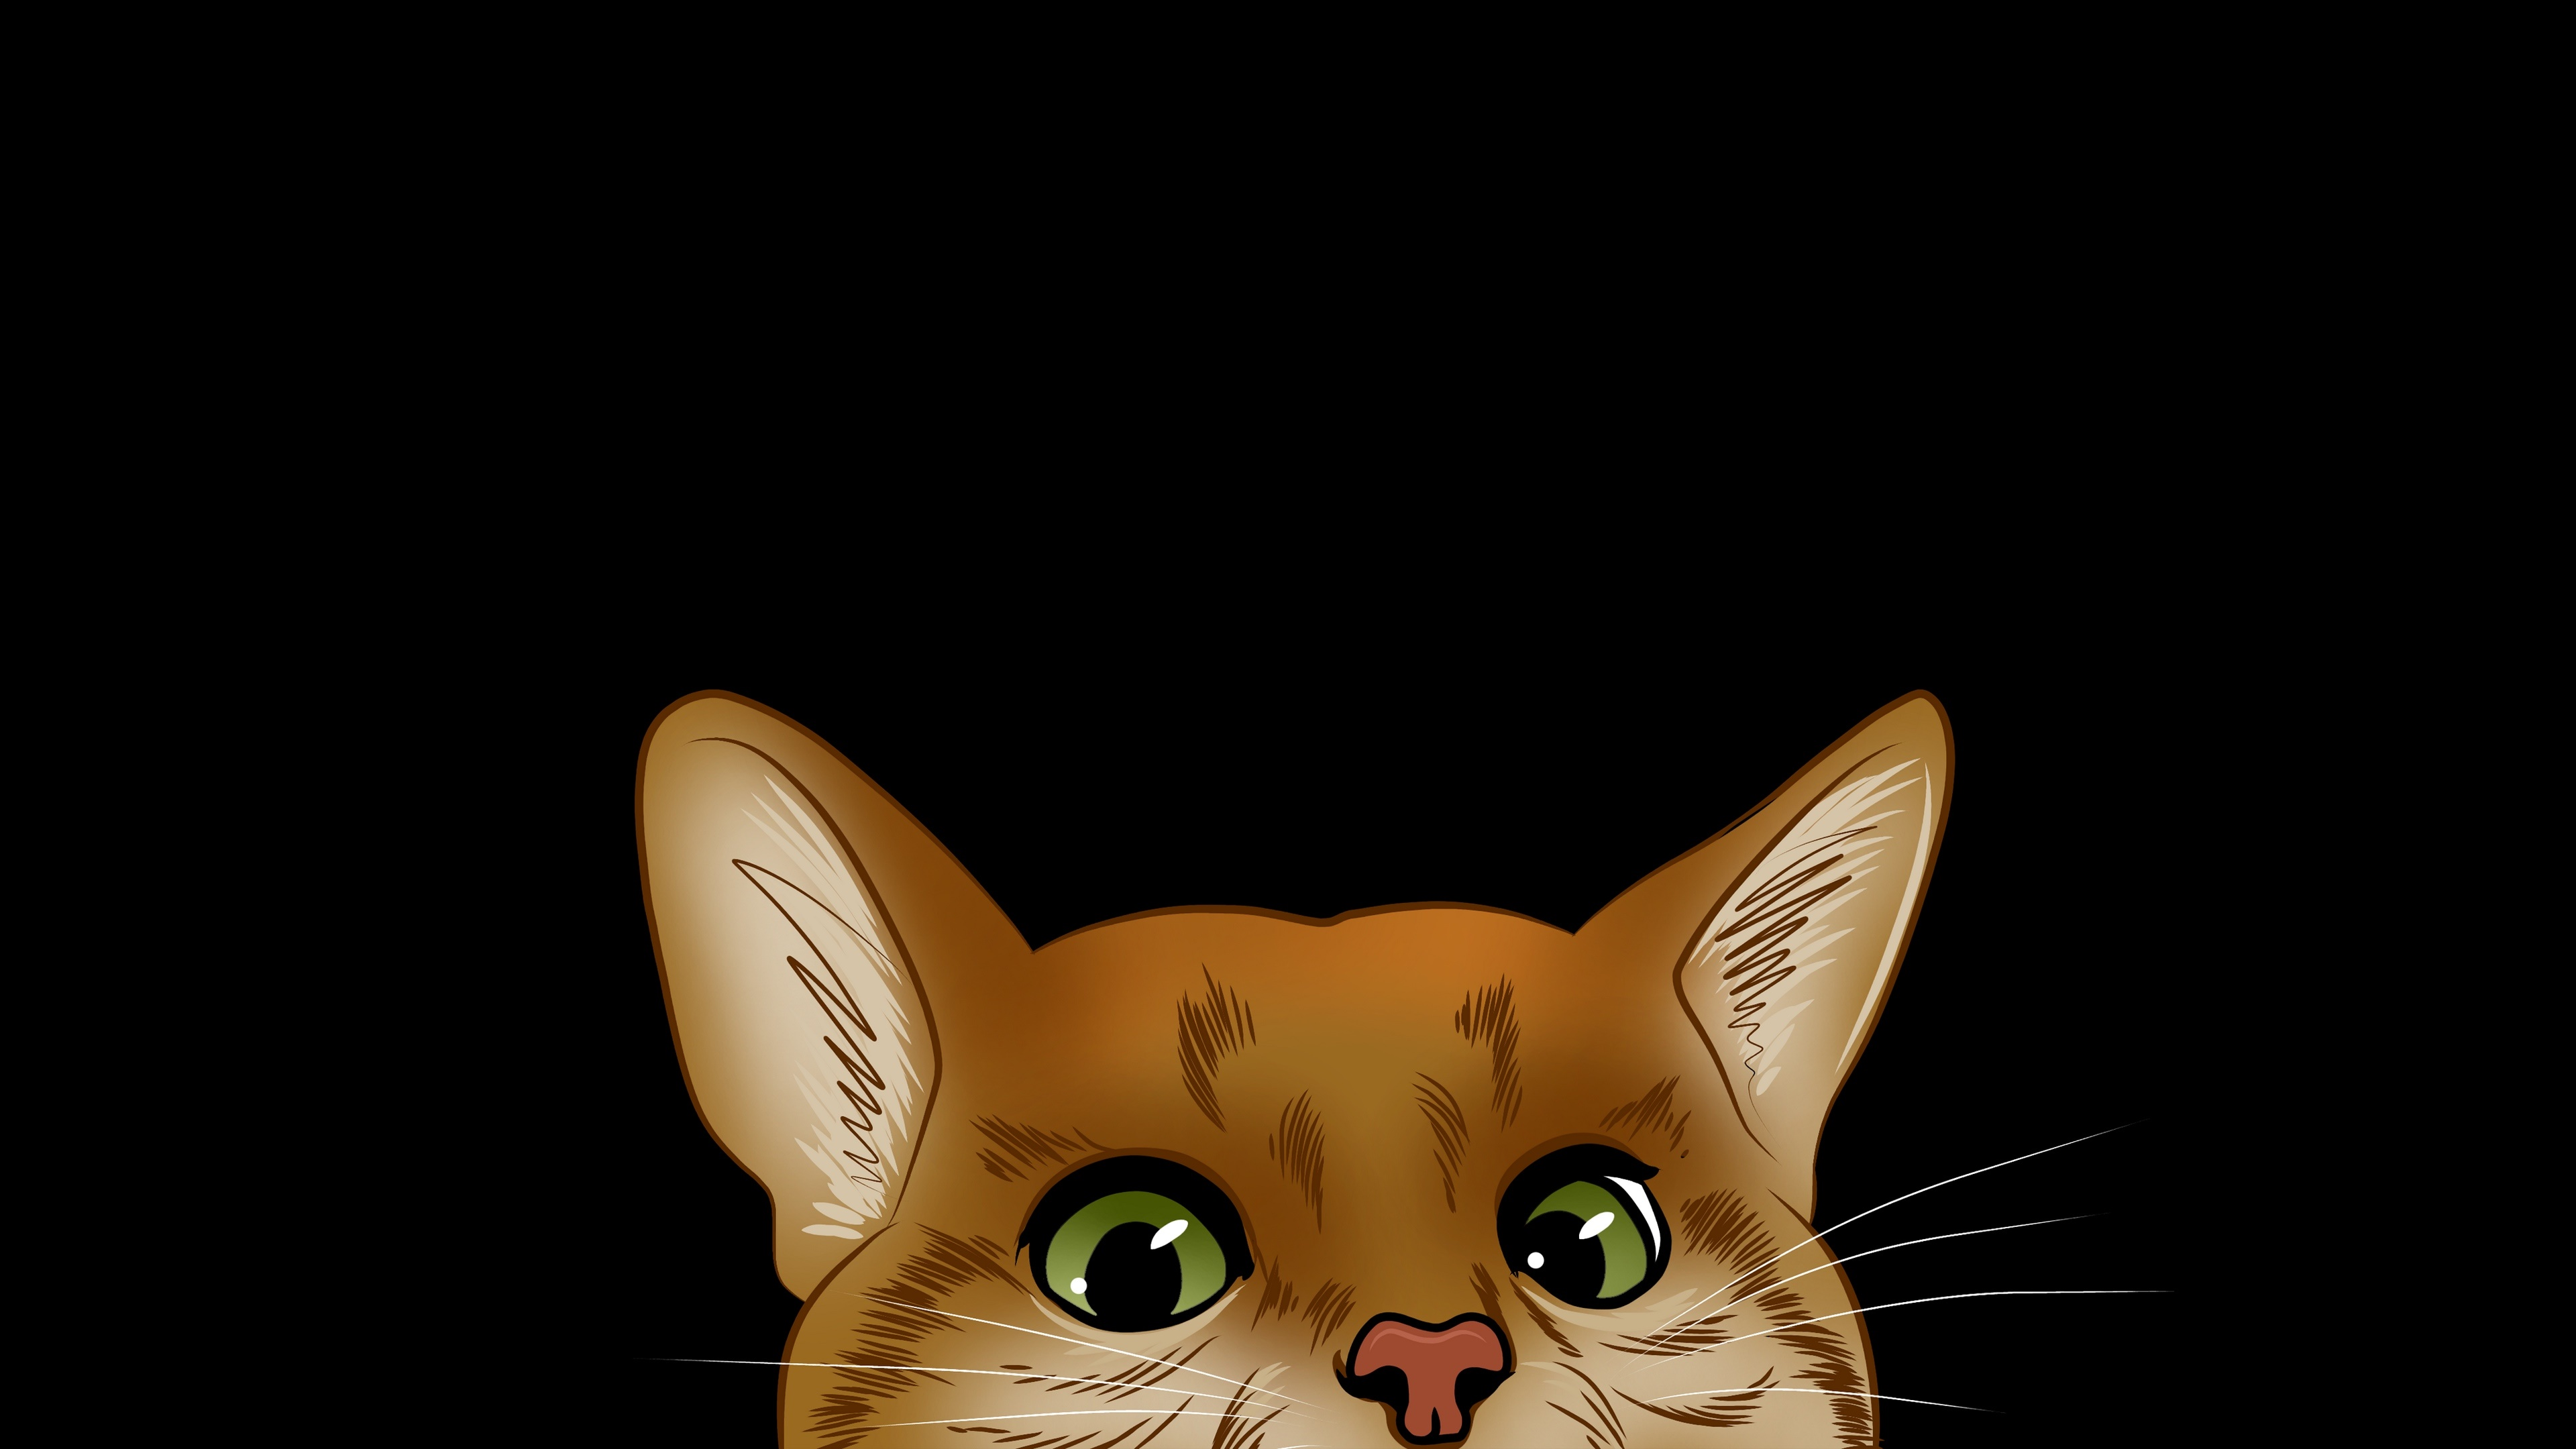 Peeping cat wallpaper